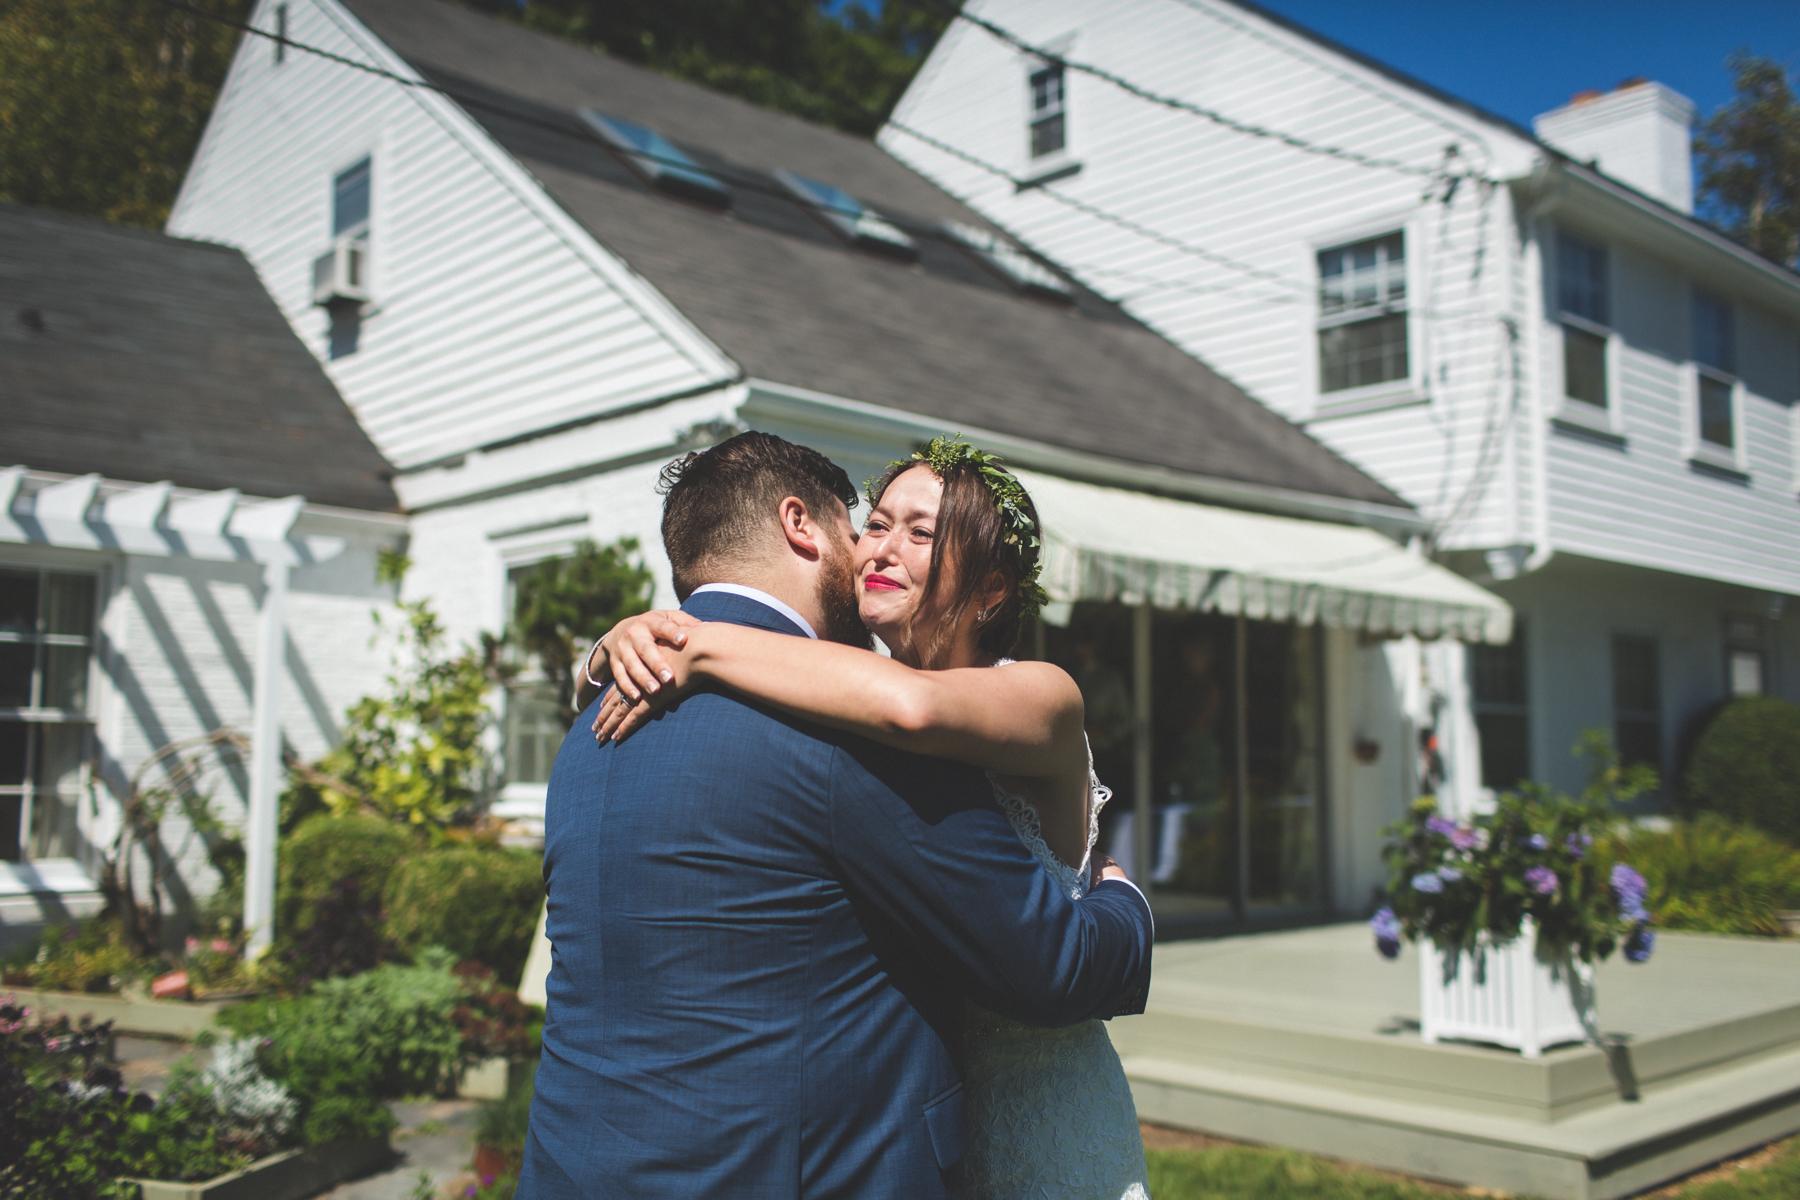 Long-Island-Documentary-Wedding-Photography-Summer-Tent-Wedding-in-New-York-22.jpg